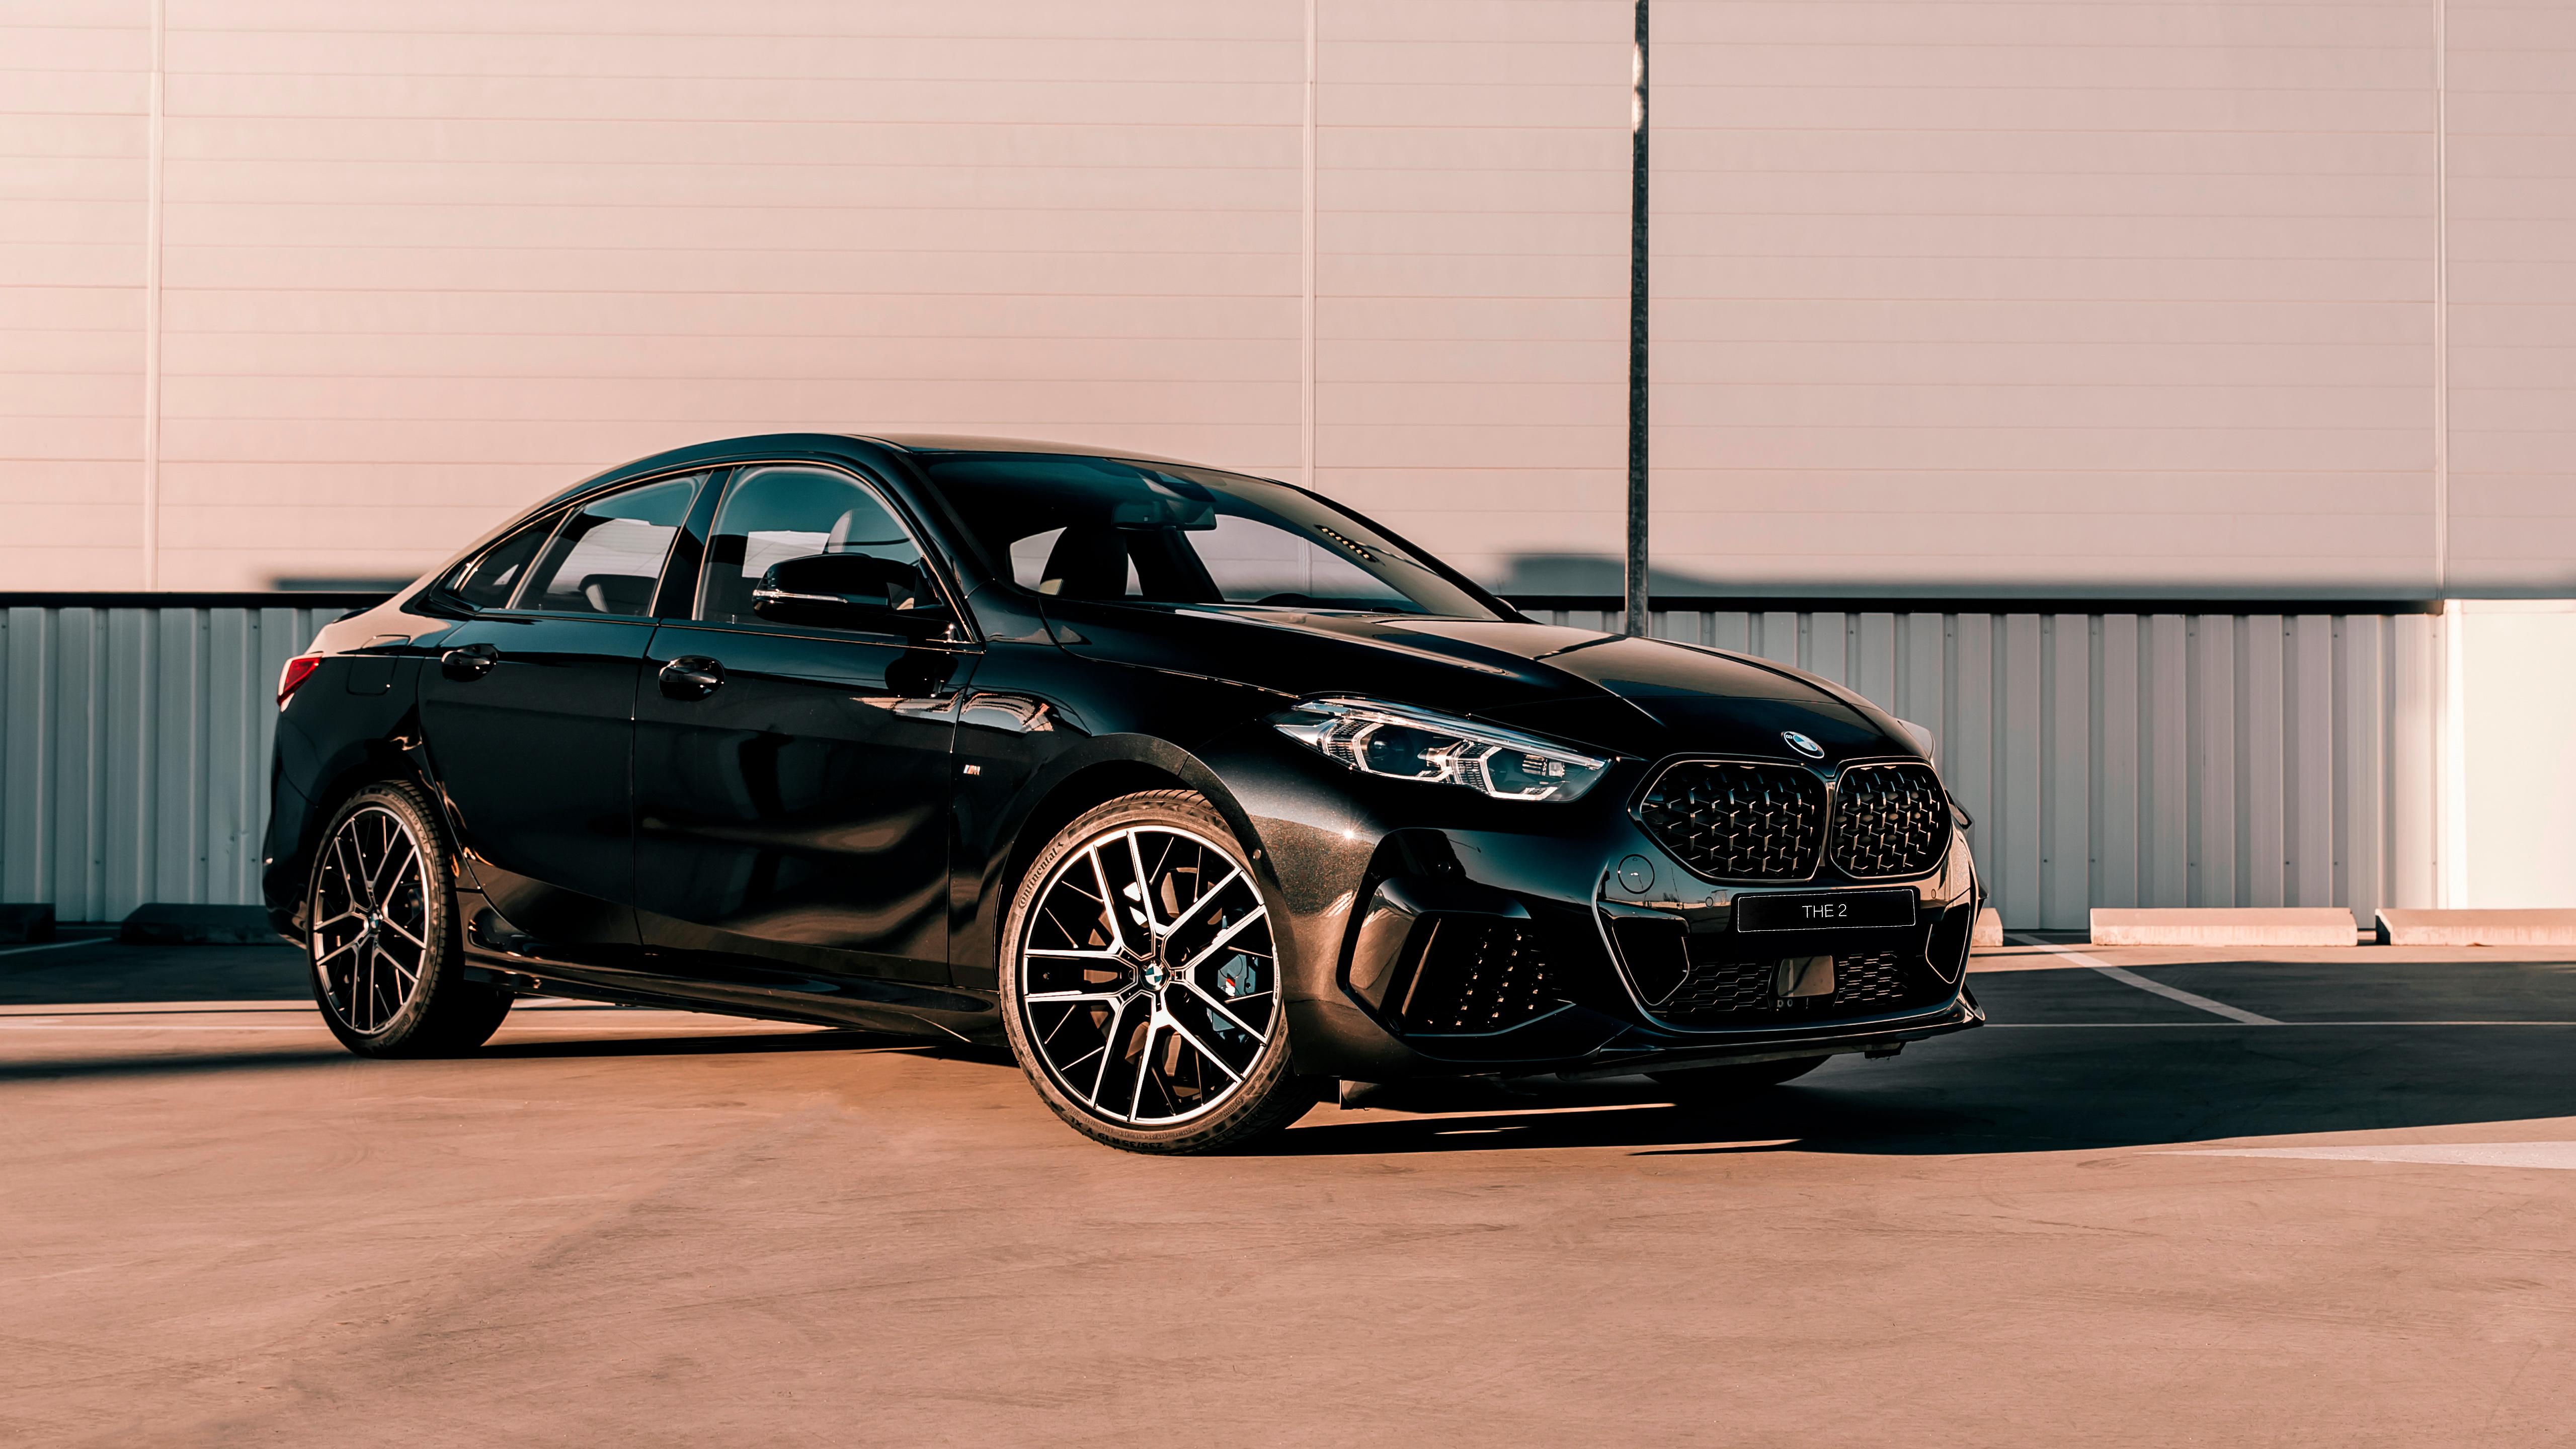 BMW M235i xDrive Gran Coupe Black Shadow Edition 2020 5K ...